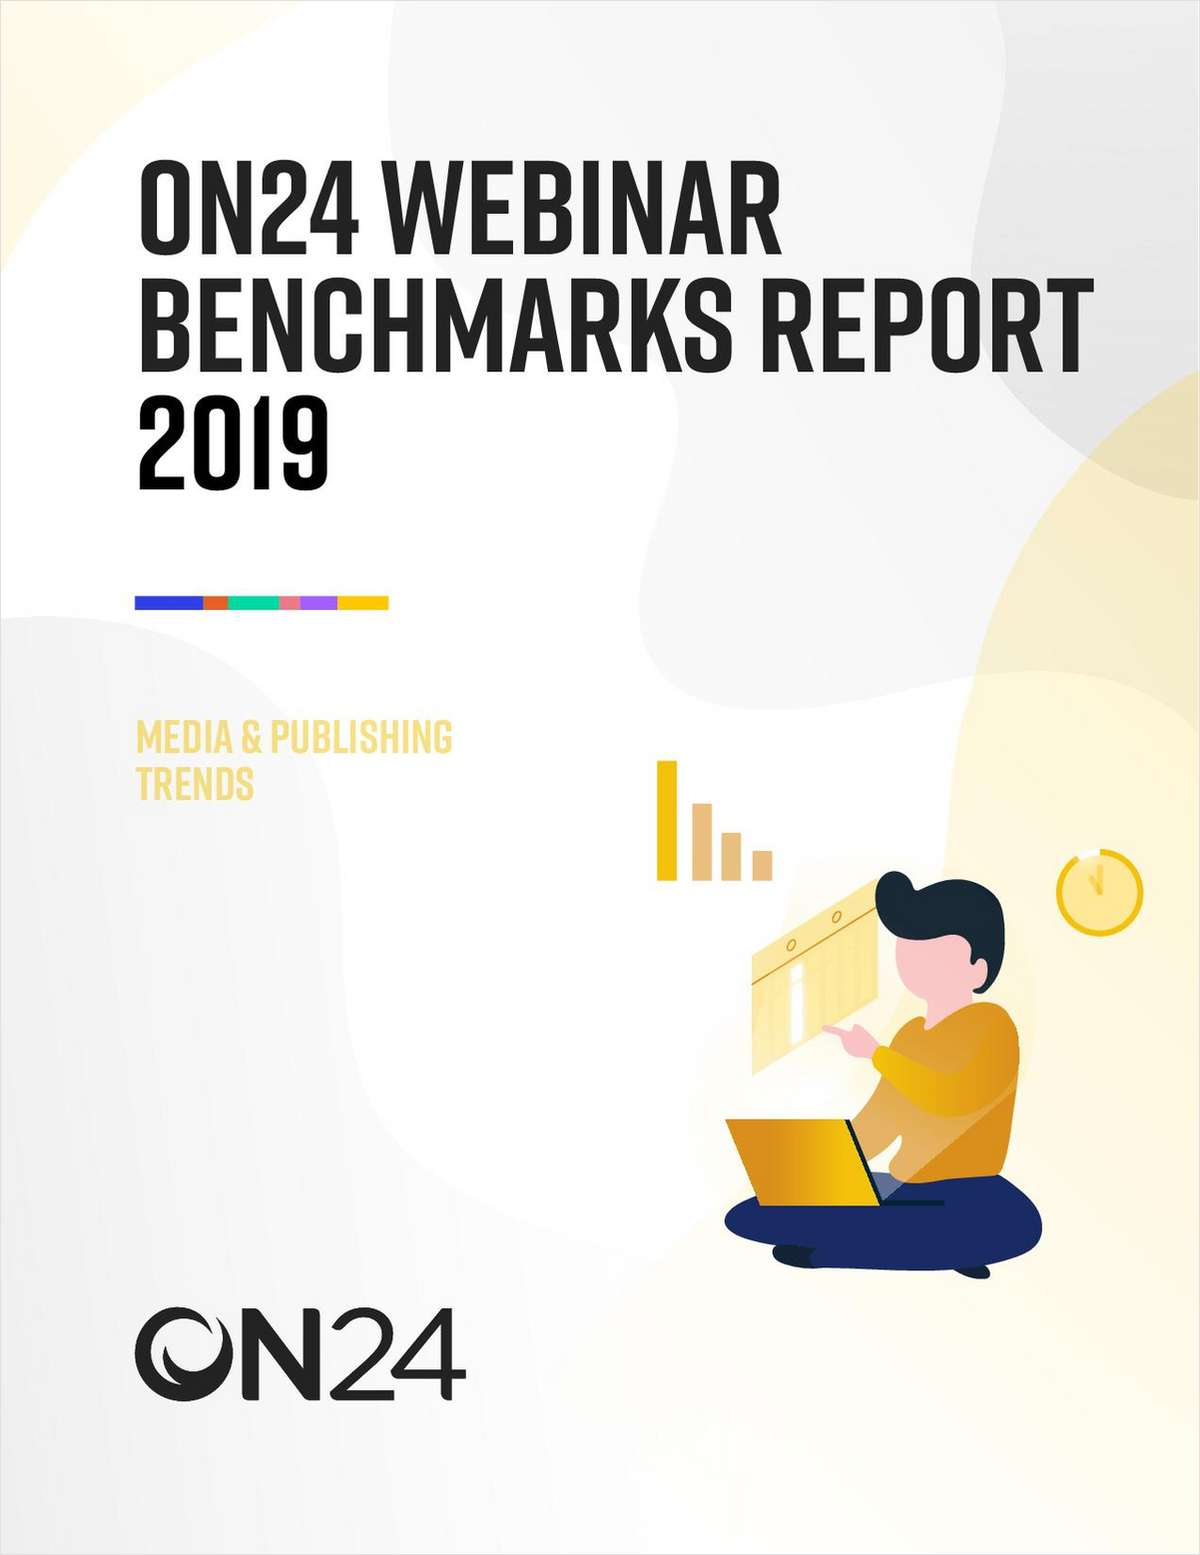 Webinar Benchmarks Report for Media & Publishing 2019